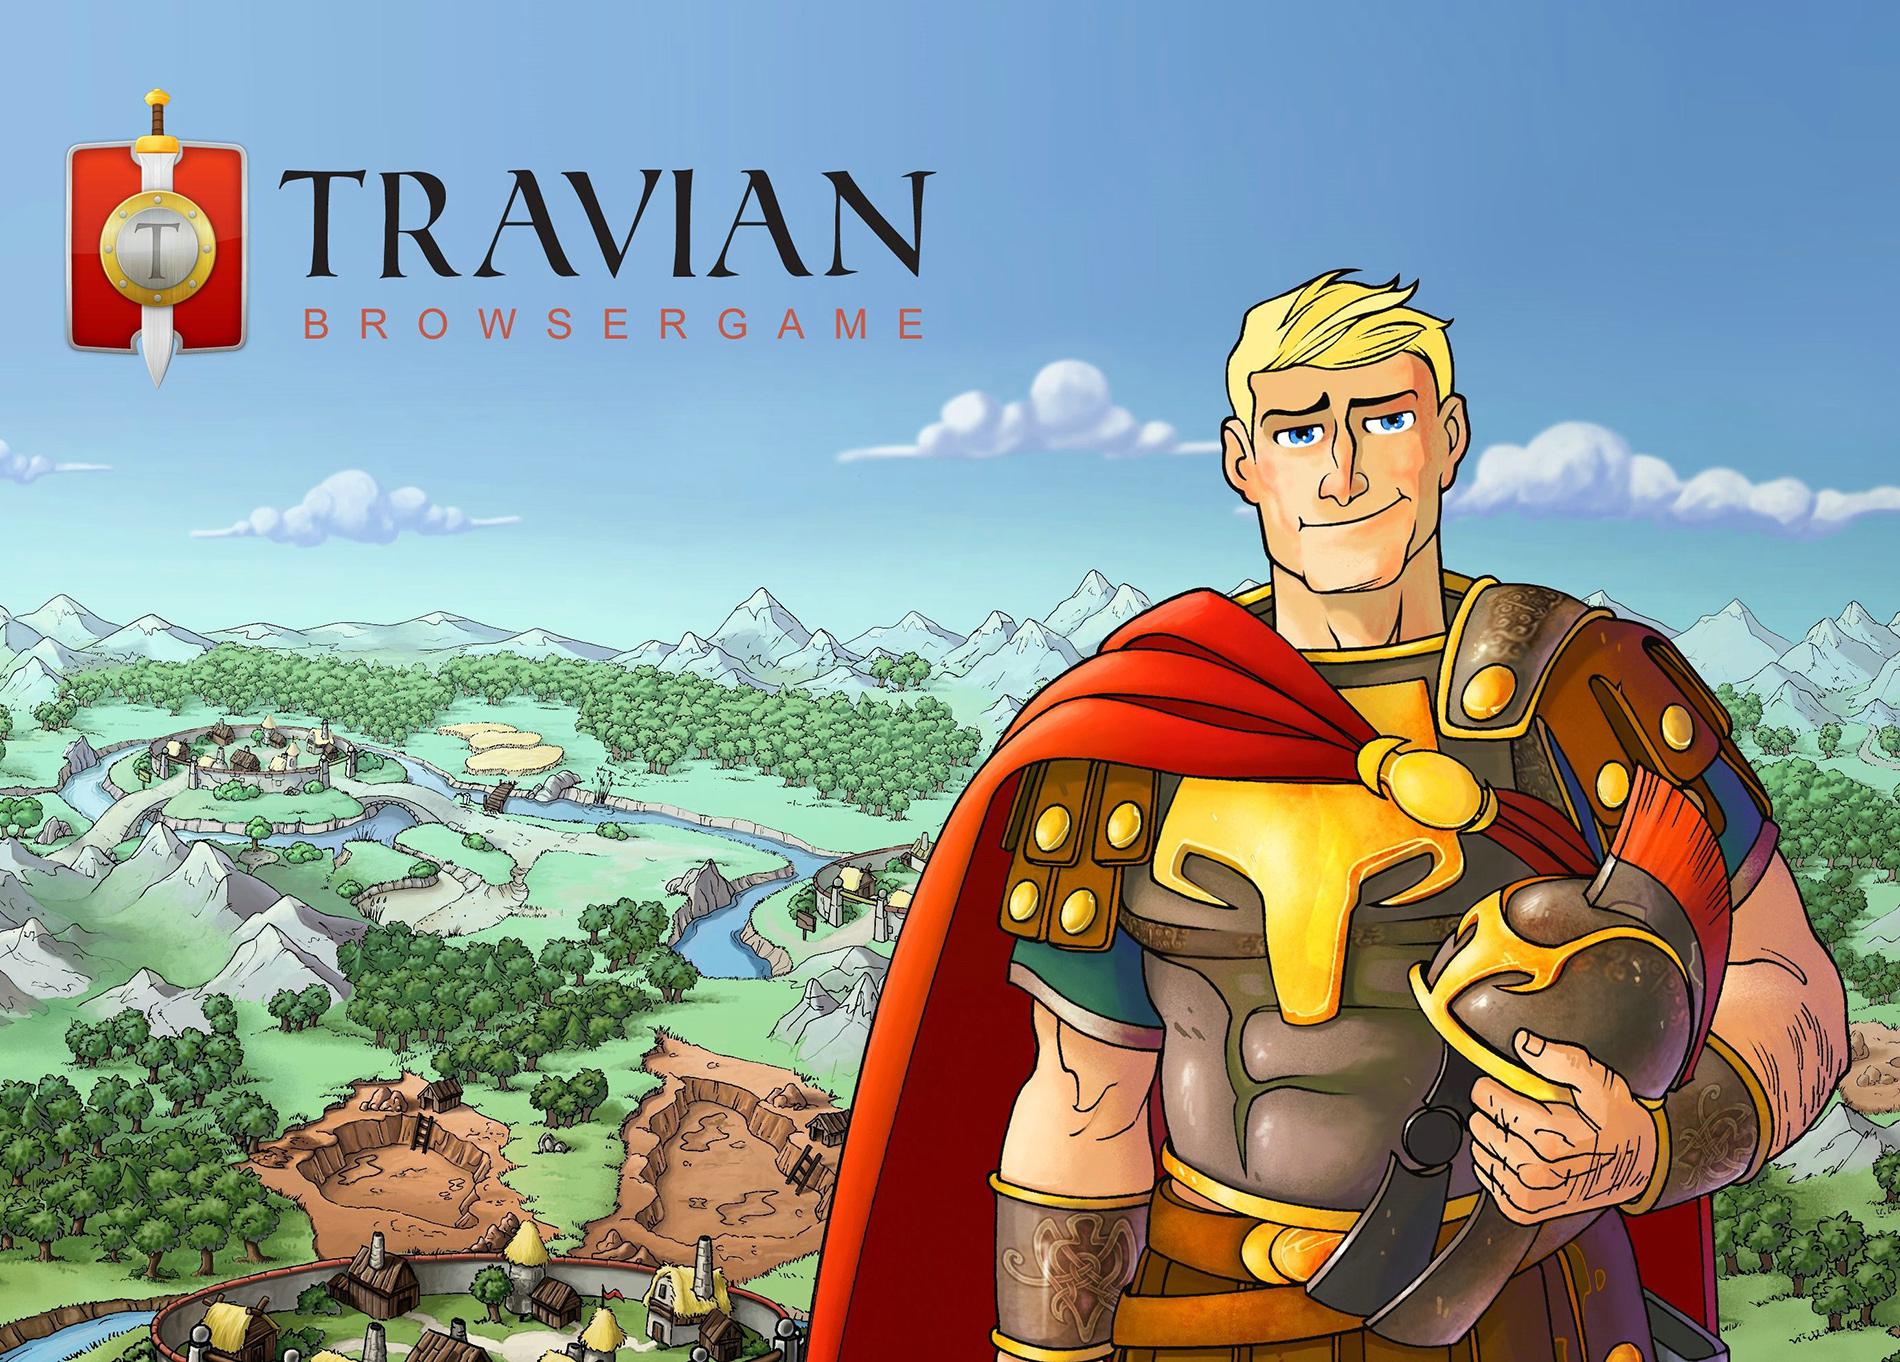 Браузерная онлайн игра TRAVIAN